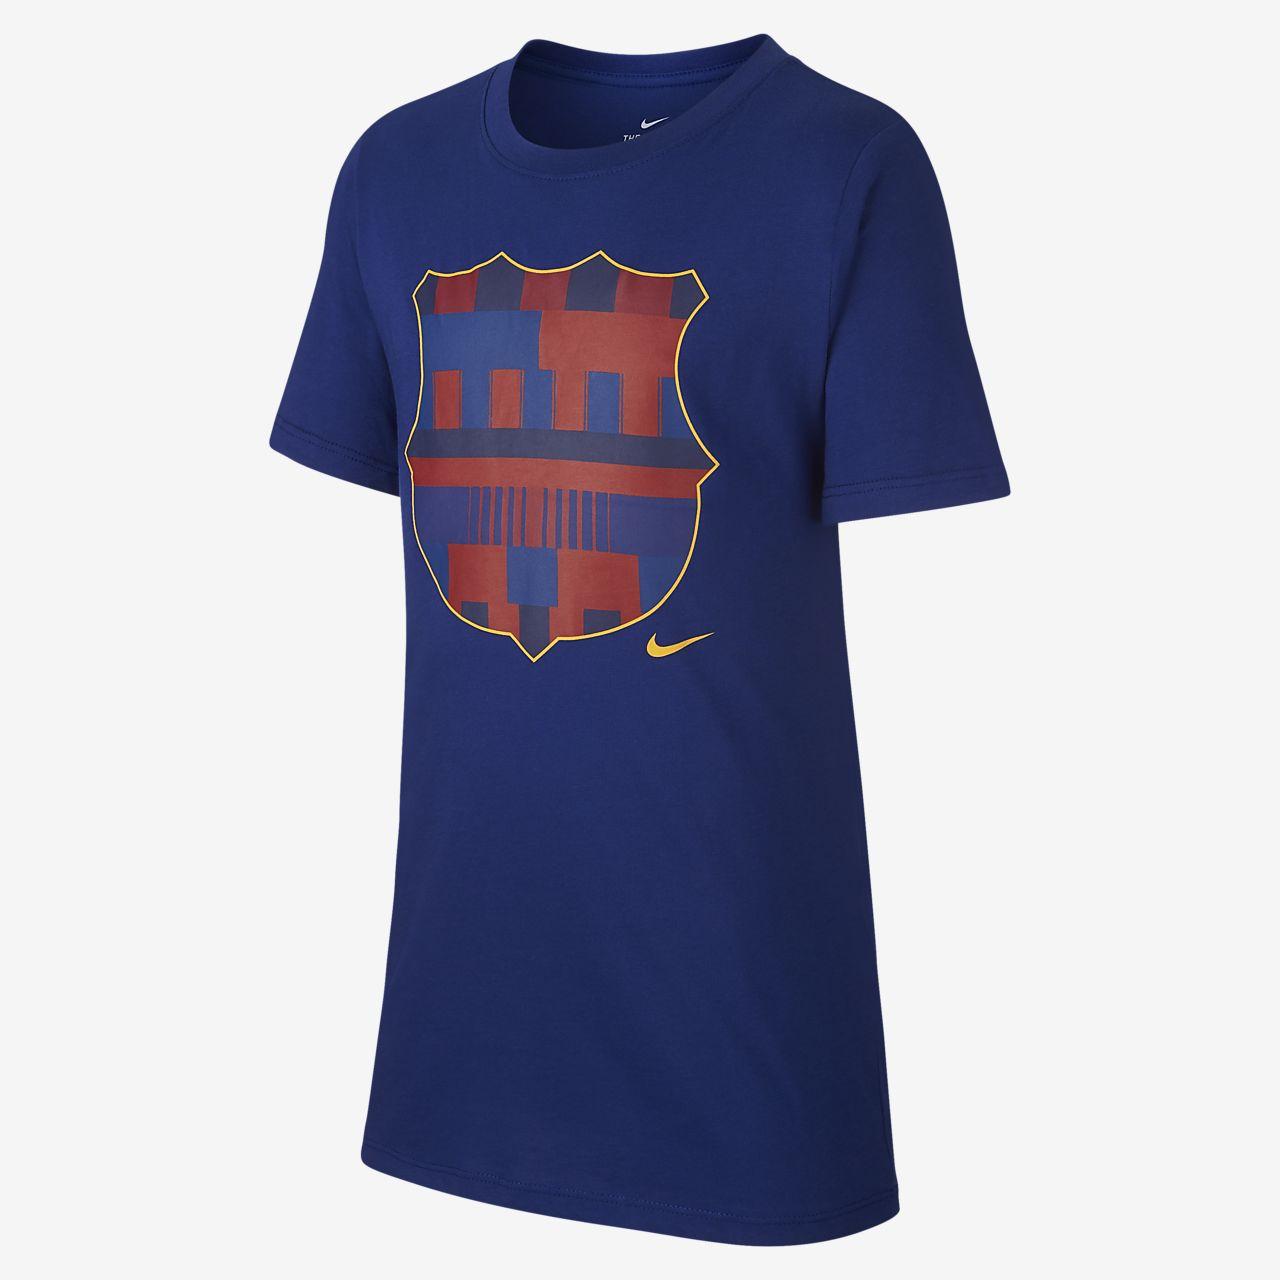 FC Barcelona Older Kids  (Boys ) T-Shirt. Nike.com IE 1d48f8bd8f4